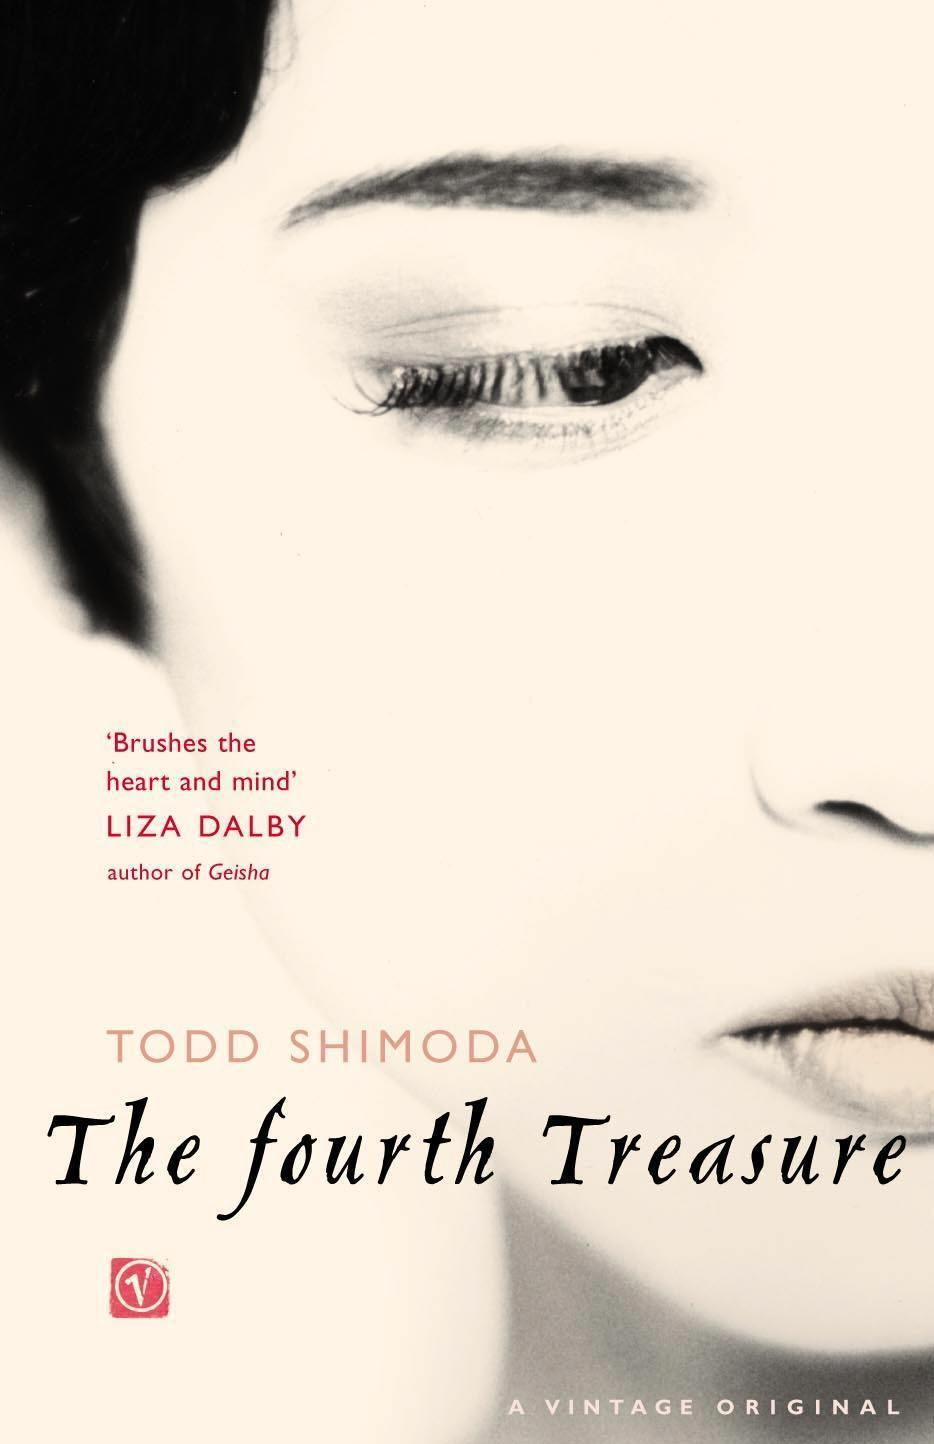 The Fourth Treasure